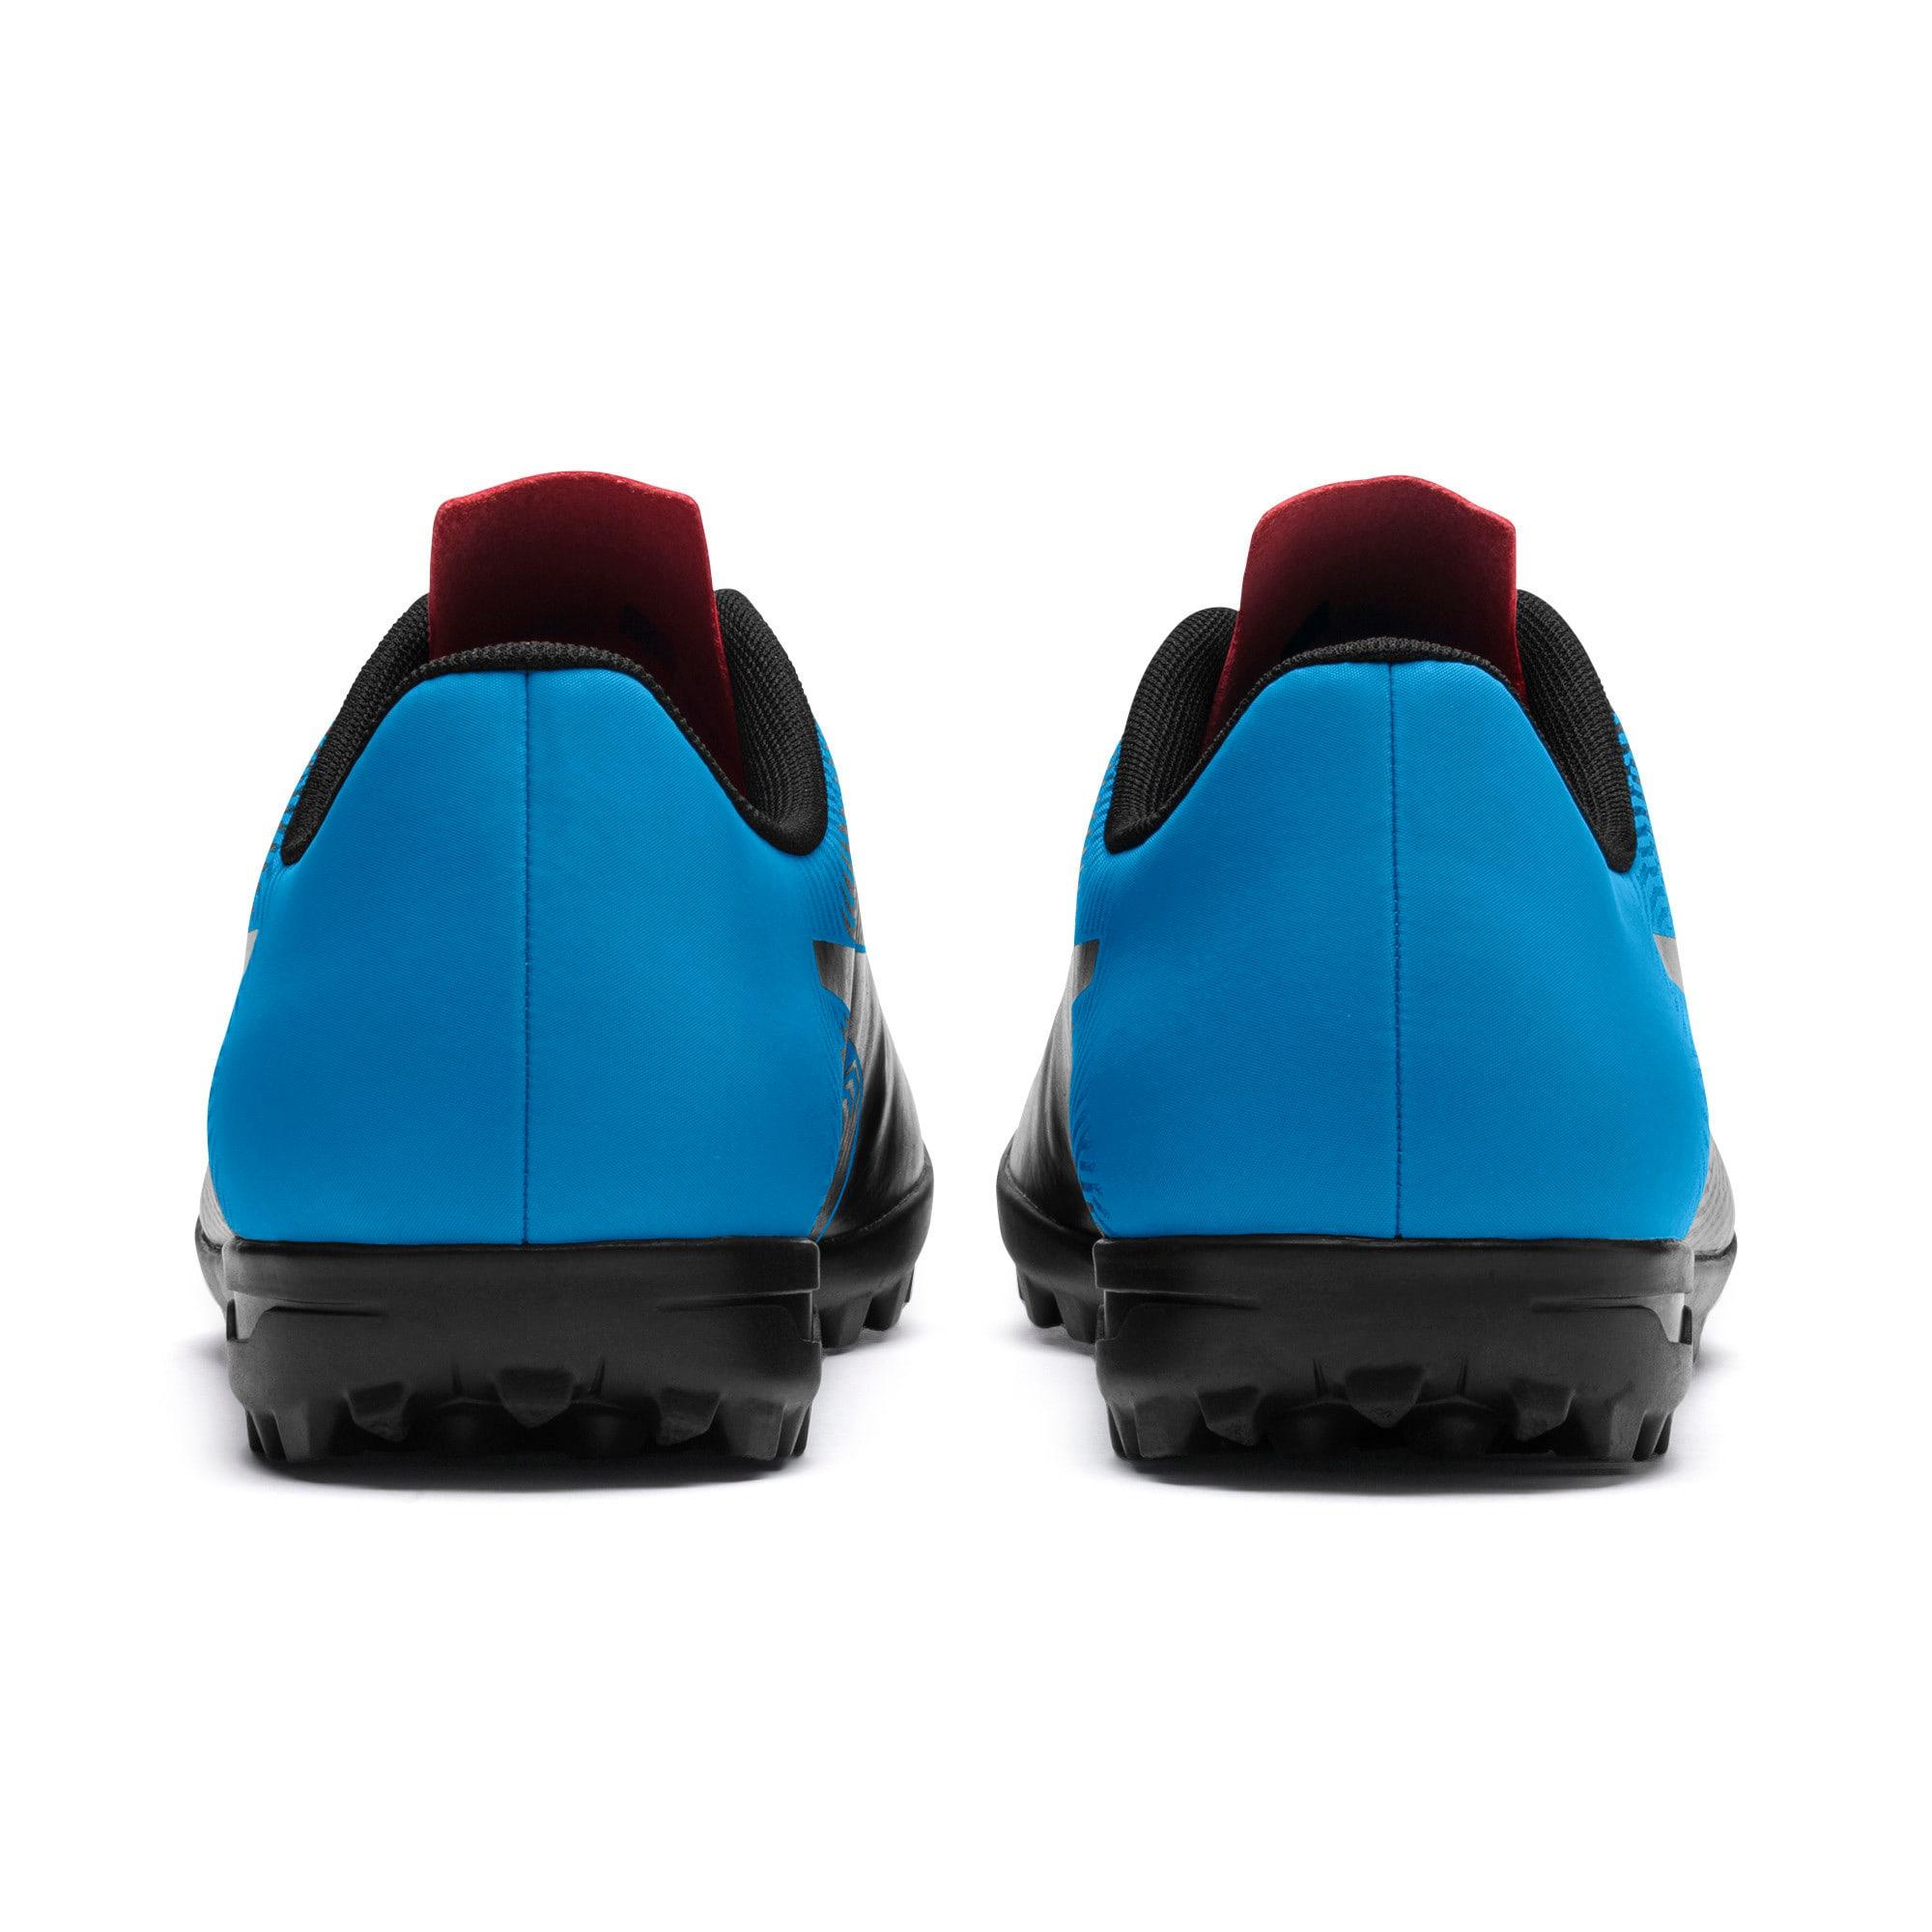 Thumbnail 4 of PUMA Spirit II TT Men's Soccer Shoes, Black-Bleu Azur-Red Blast, medium